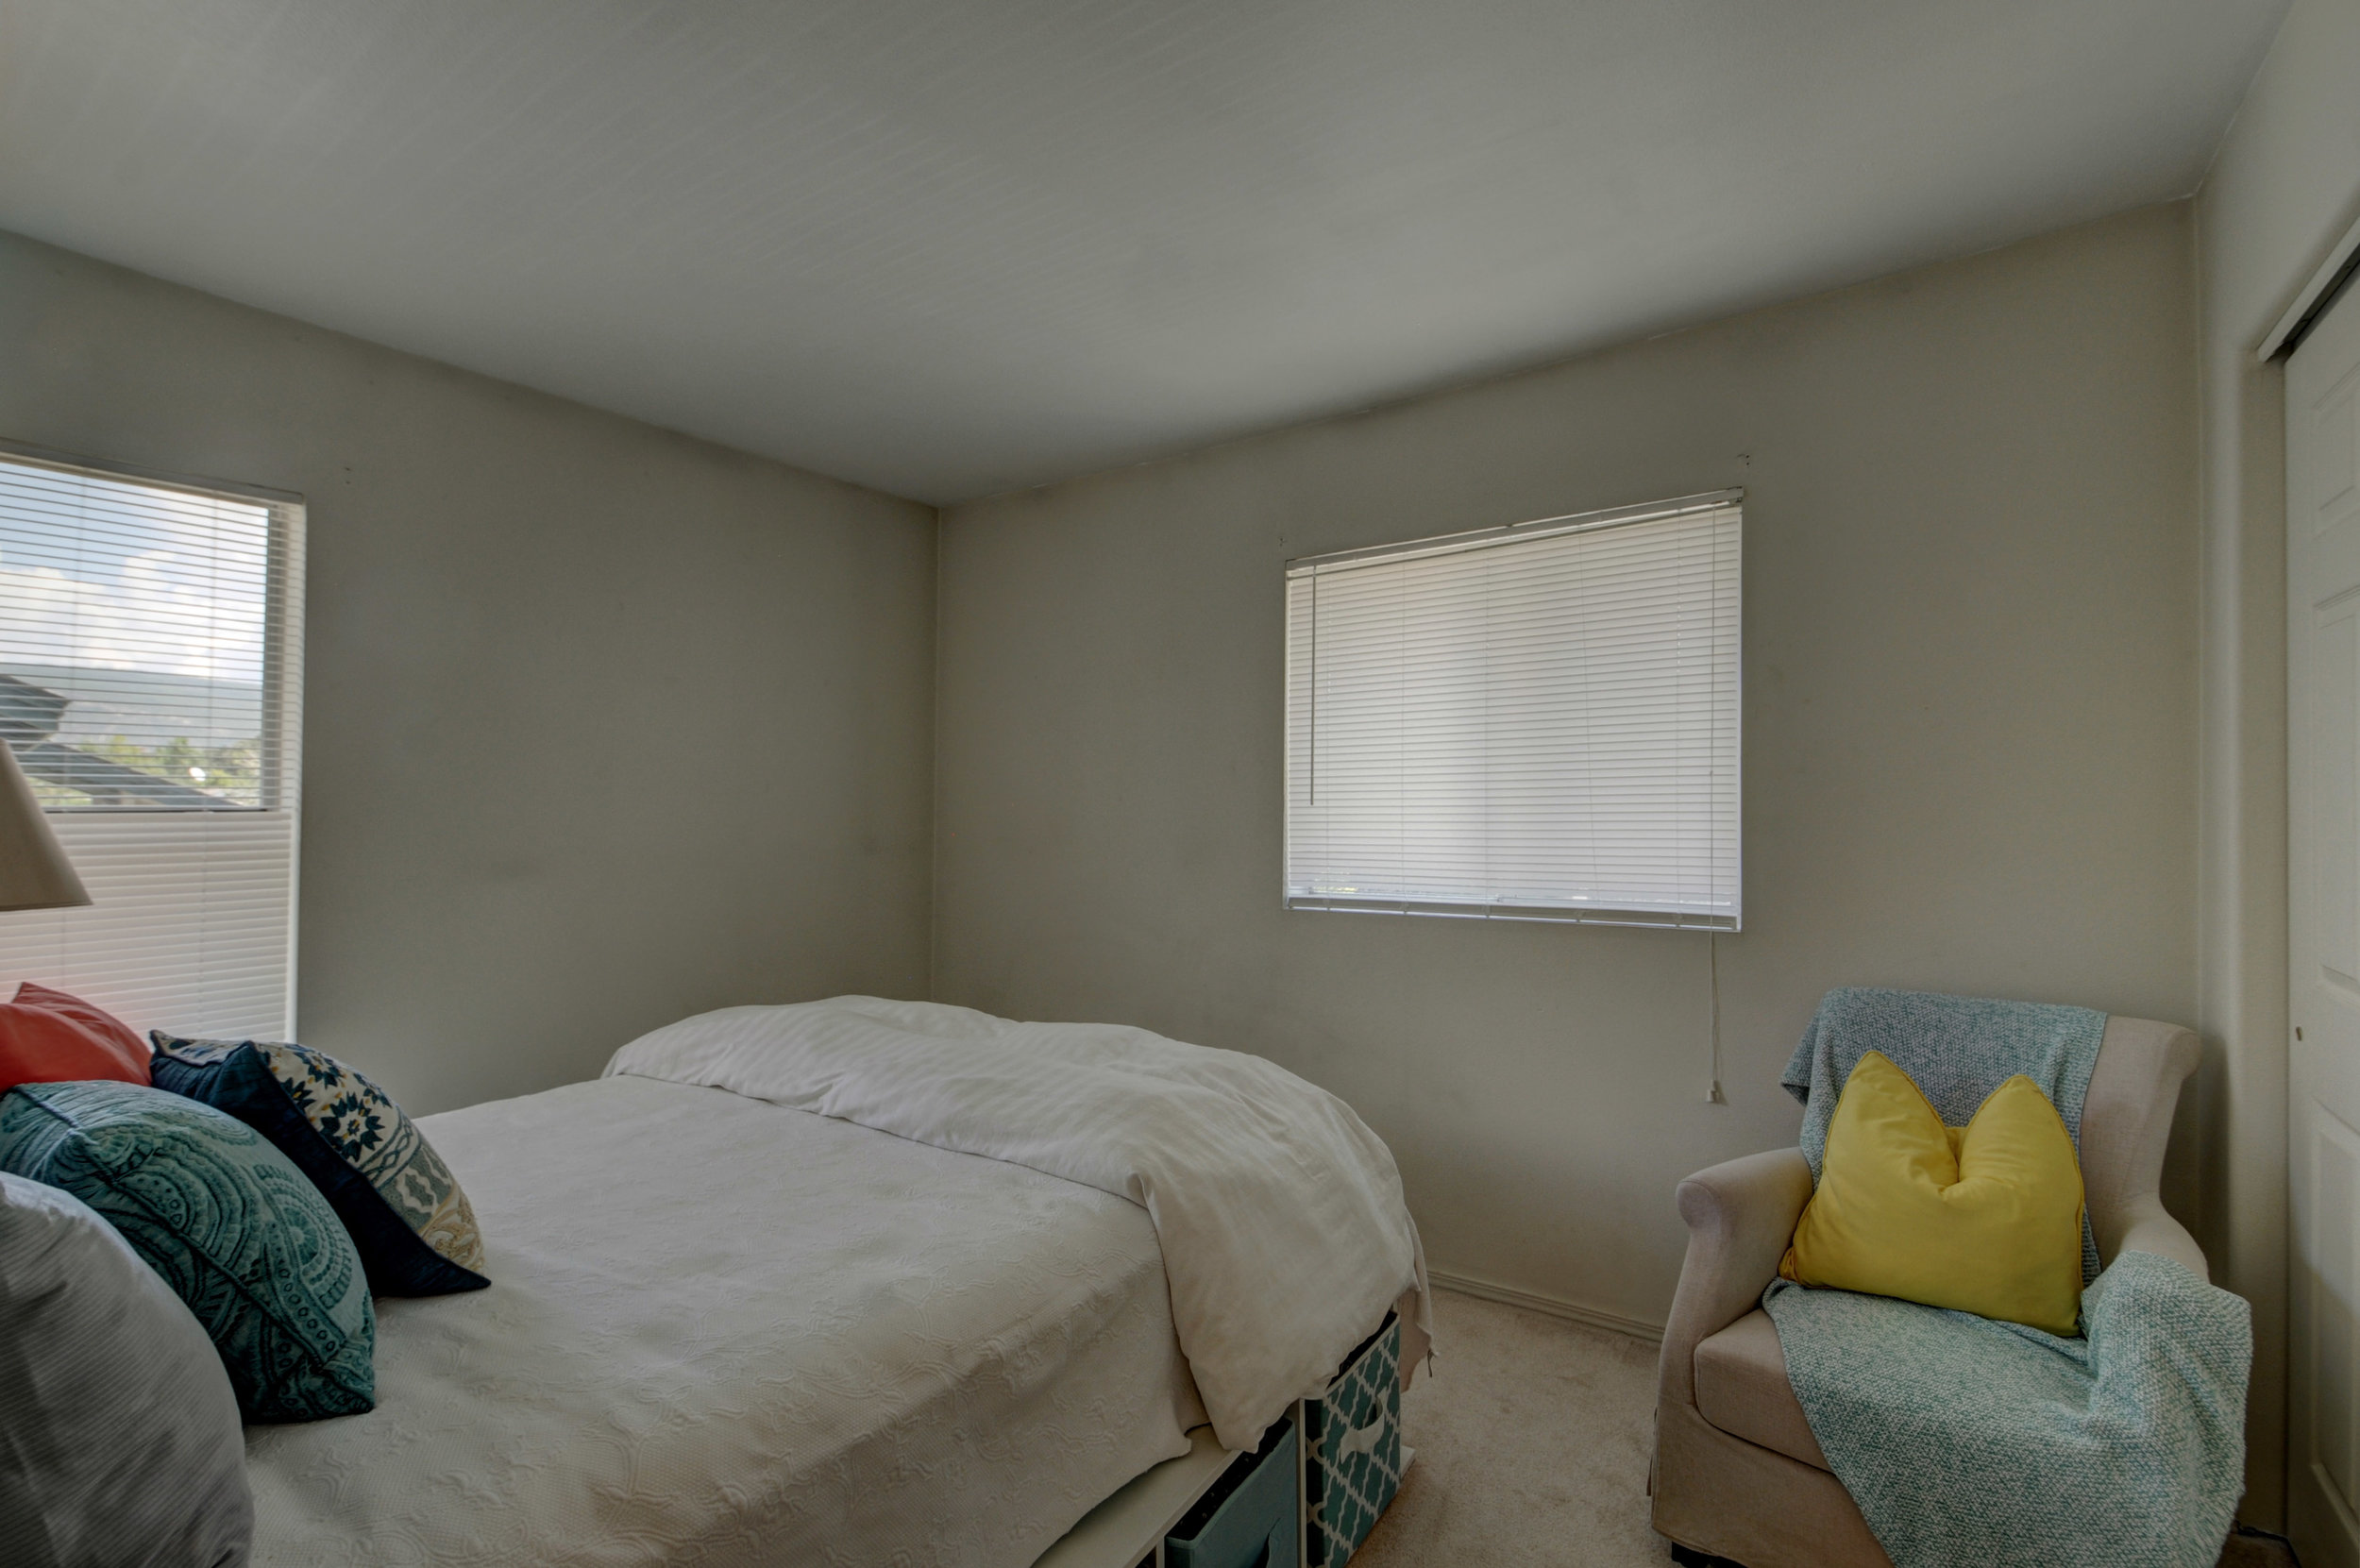 bedroom4132.jpg